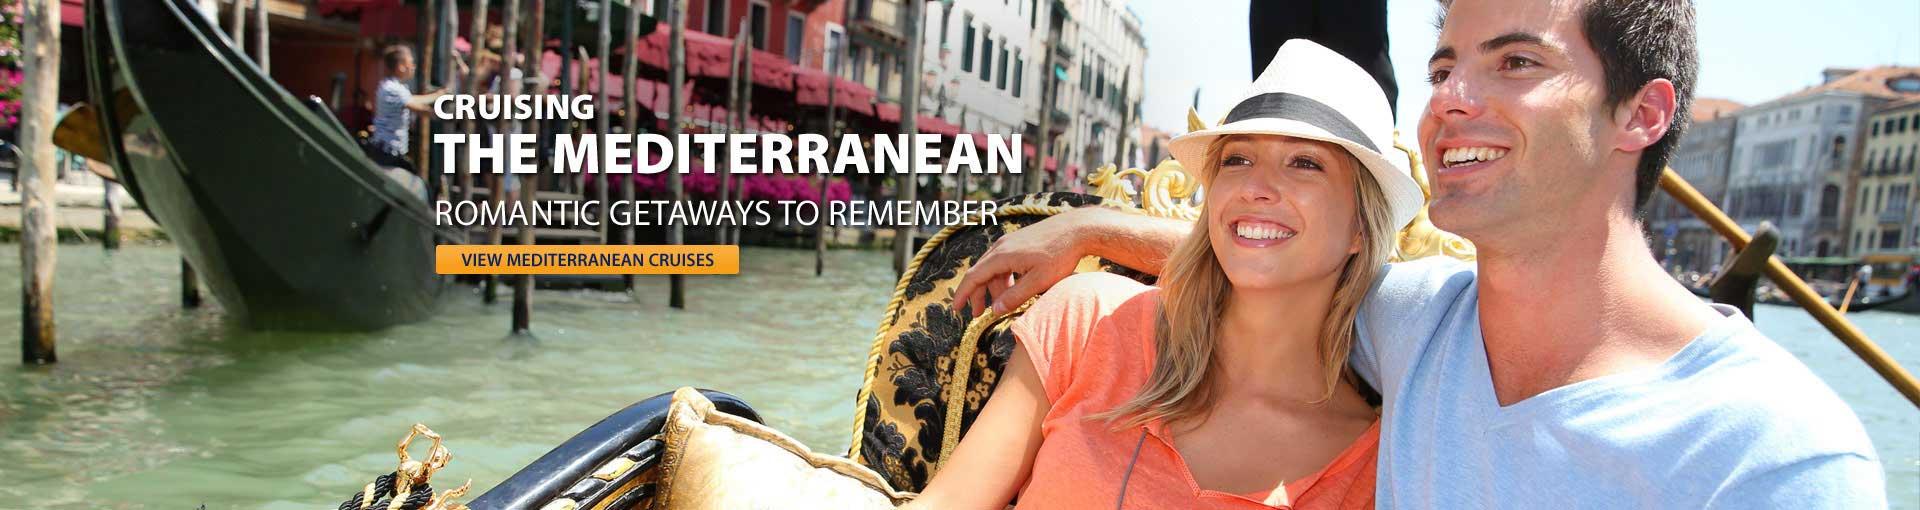 Mediterranean Cruises and Cruise Lines